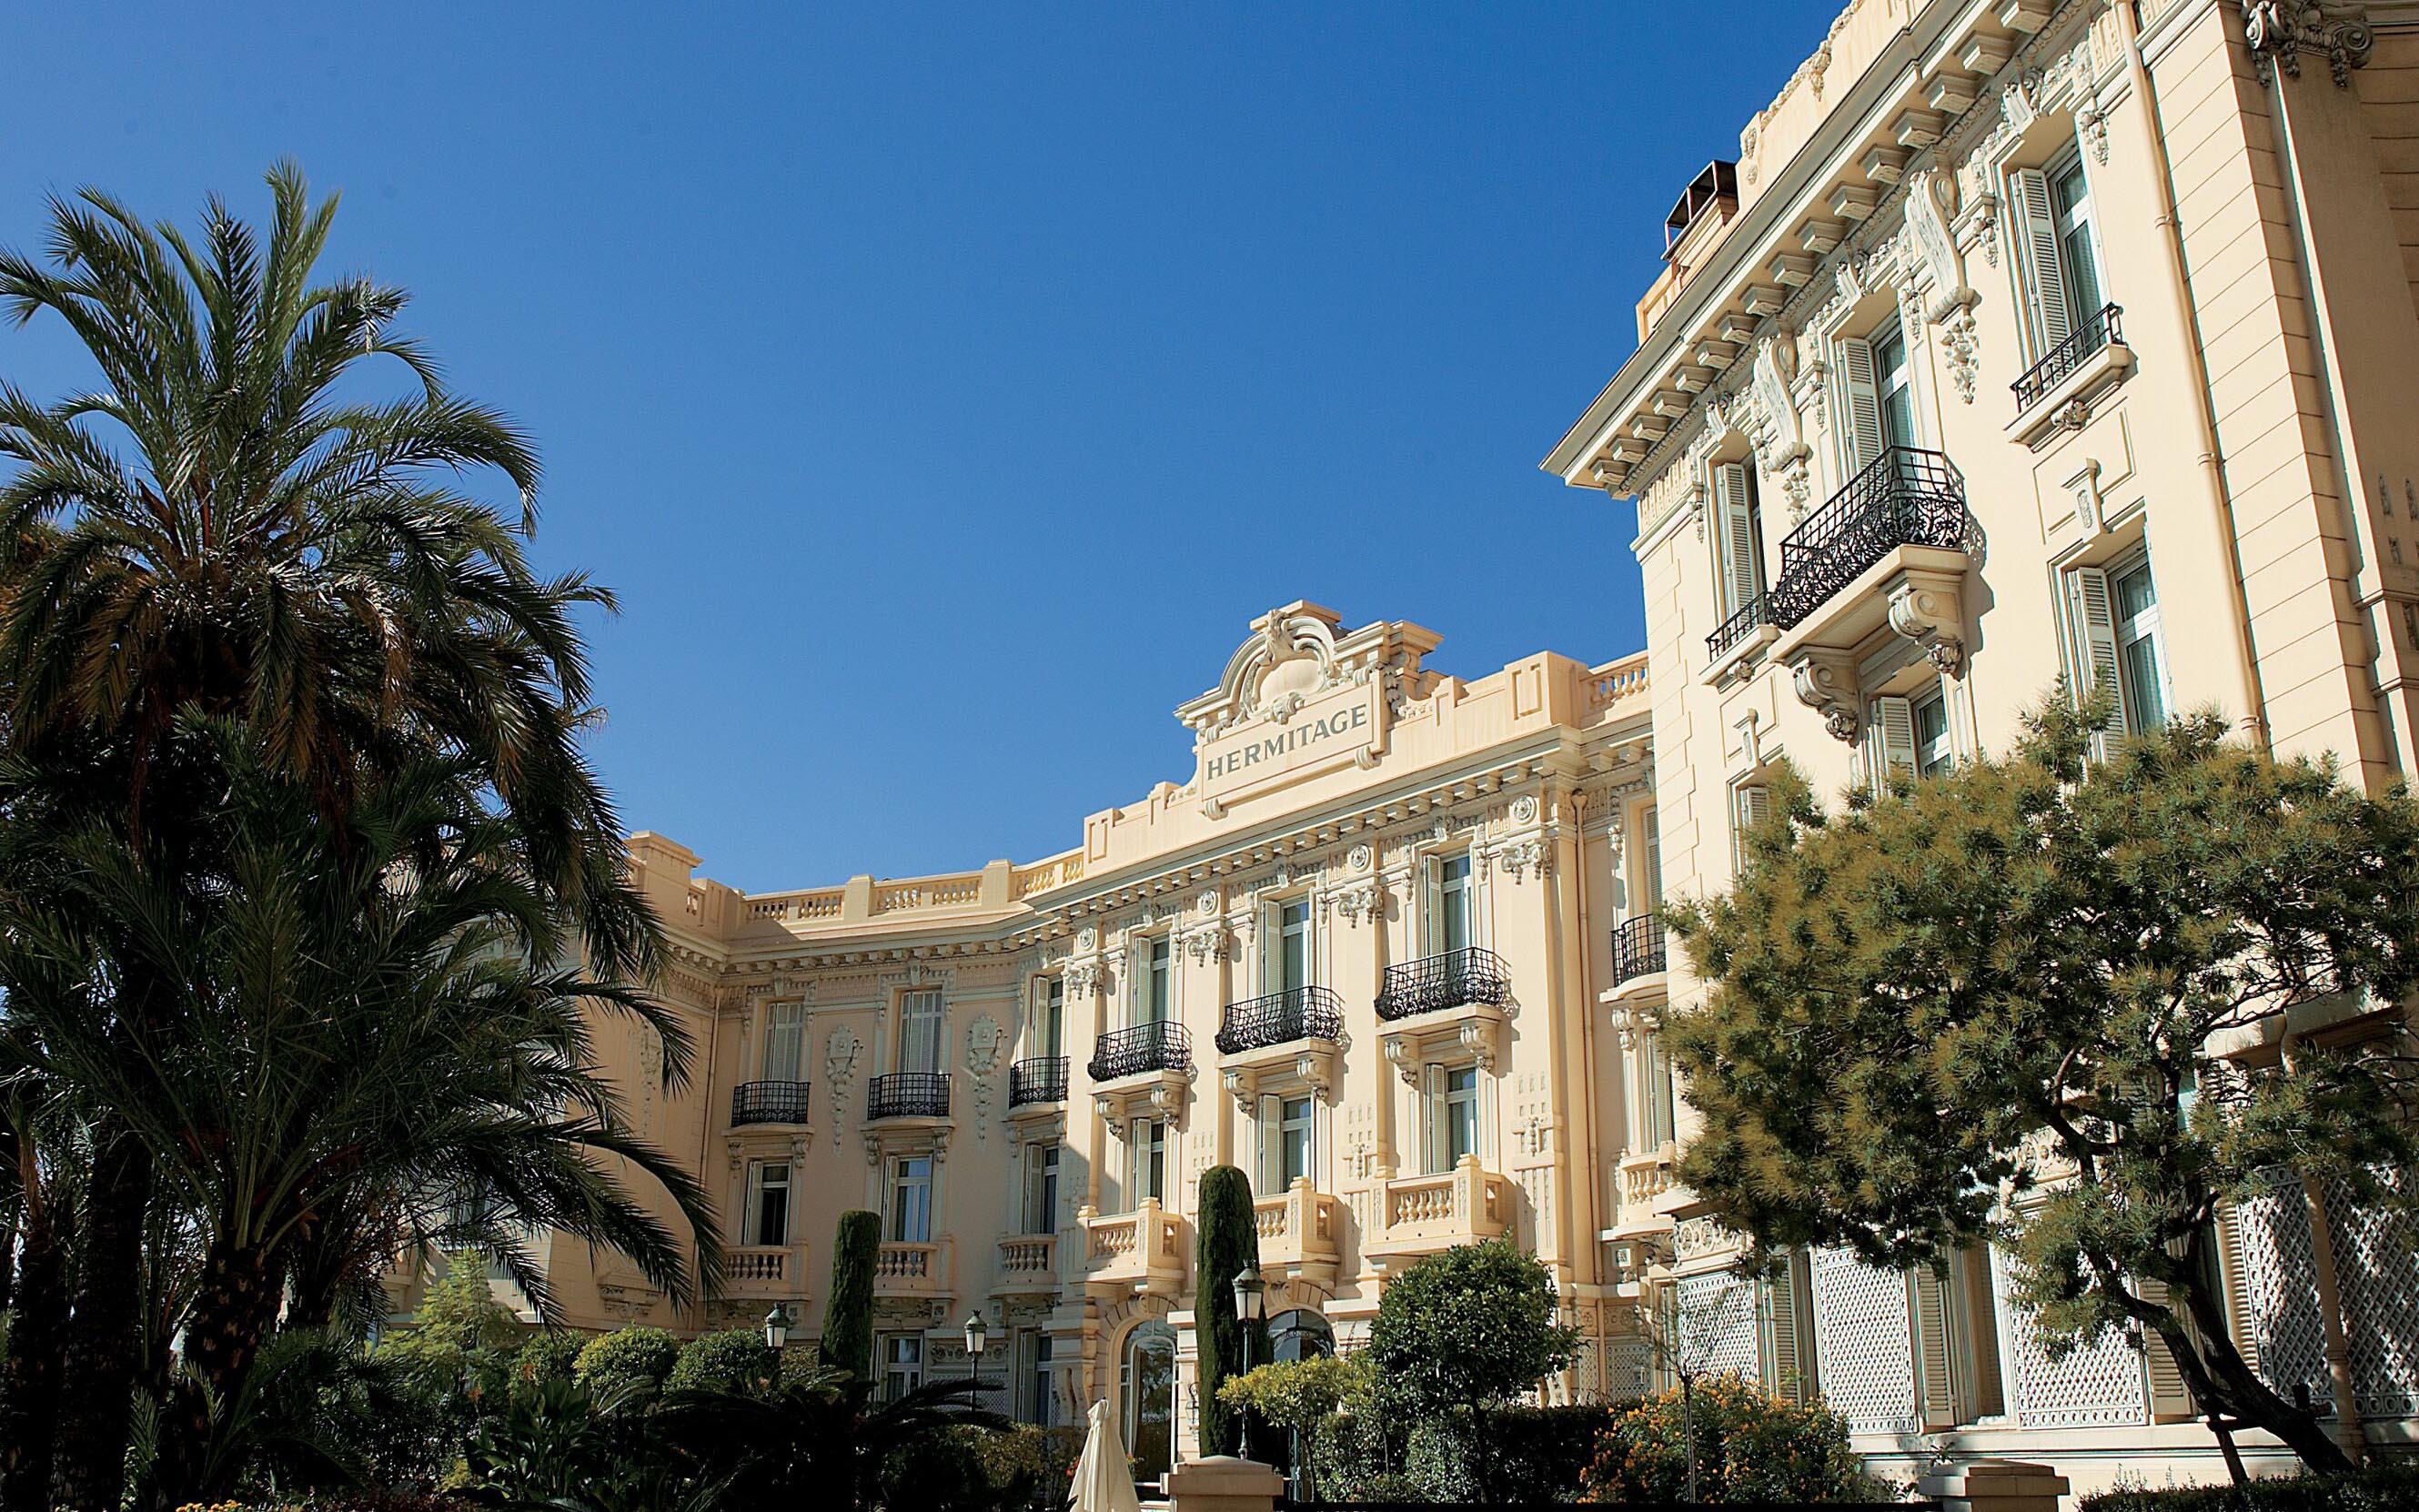 Hotel Hermitage Monte-Carlo hosts Maison Noura